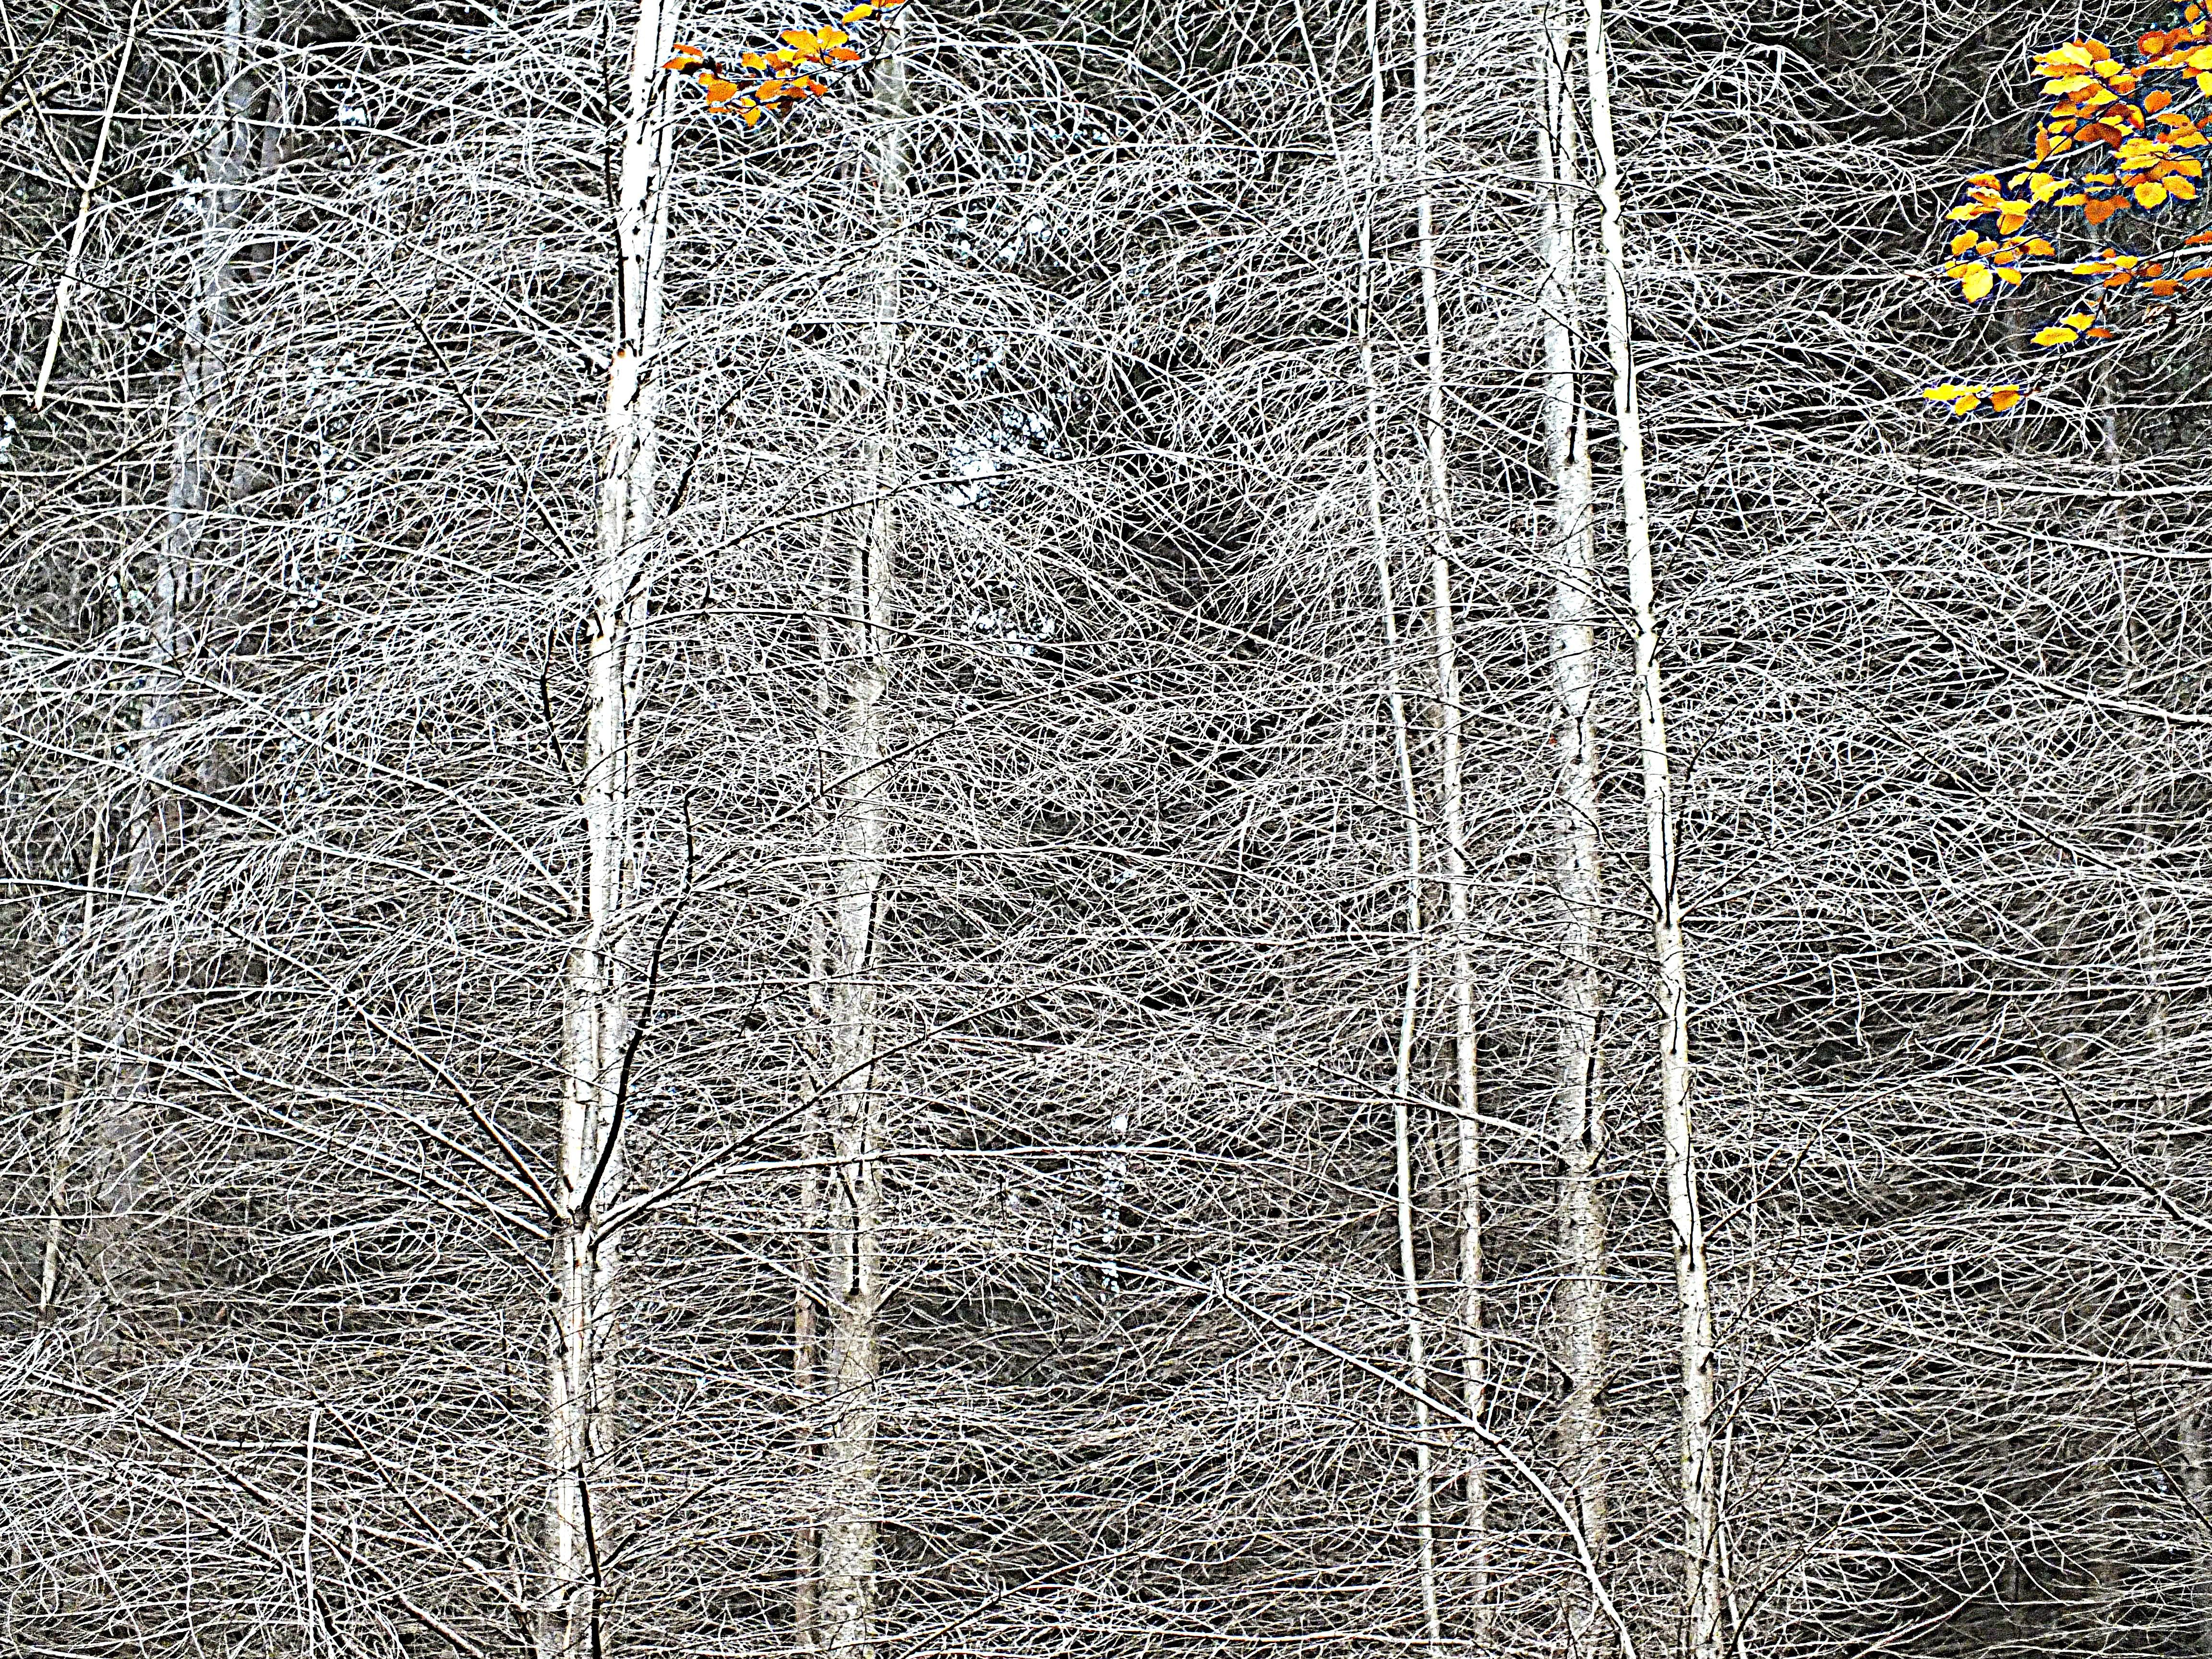 Bäume am Silbersee